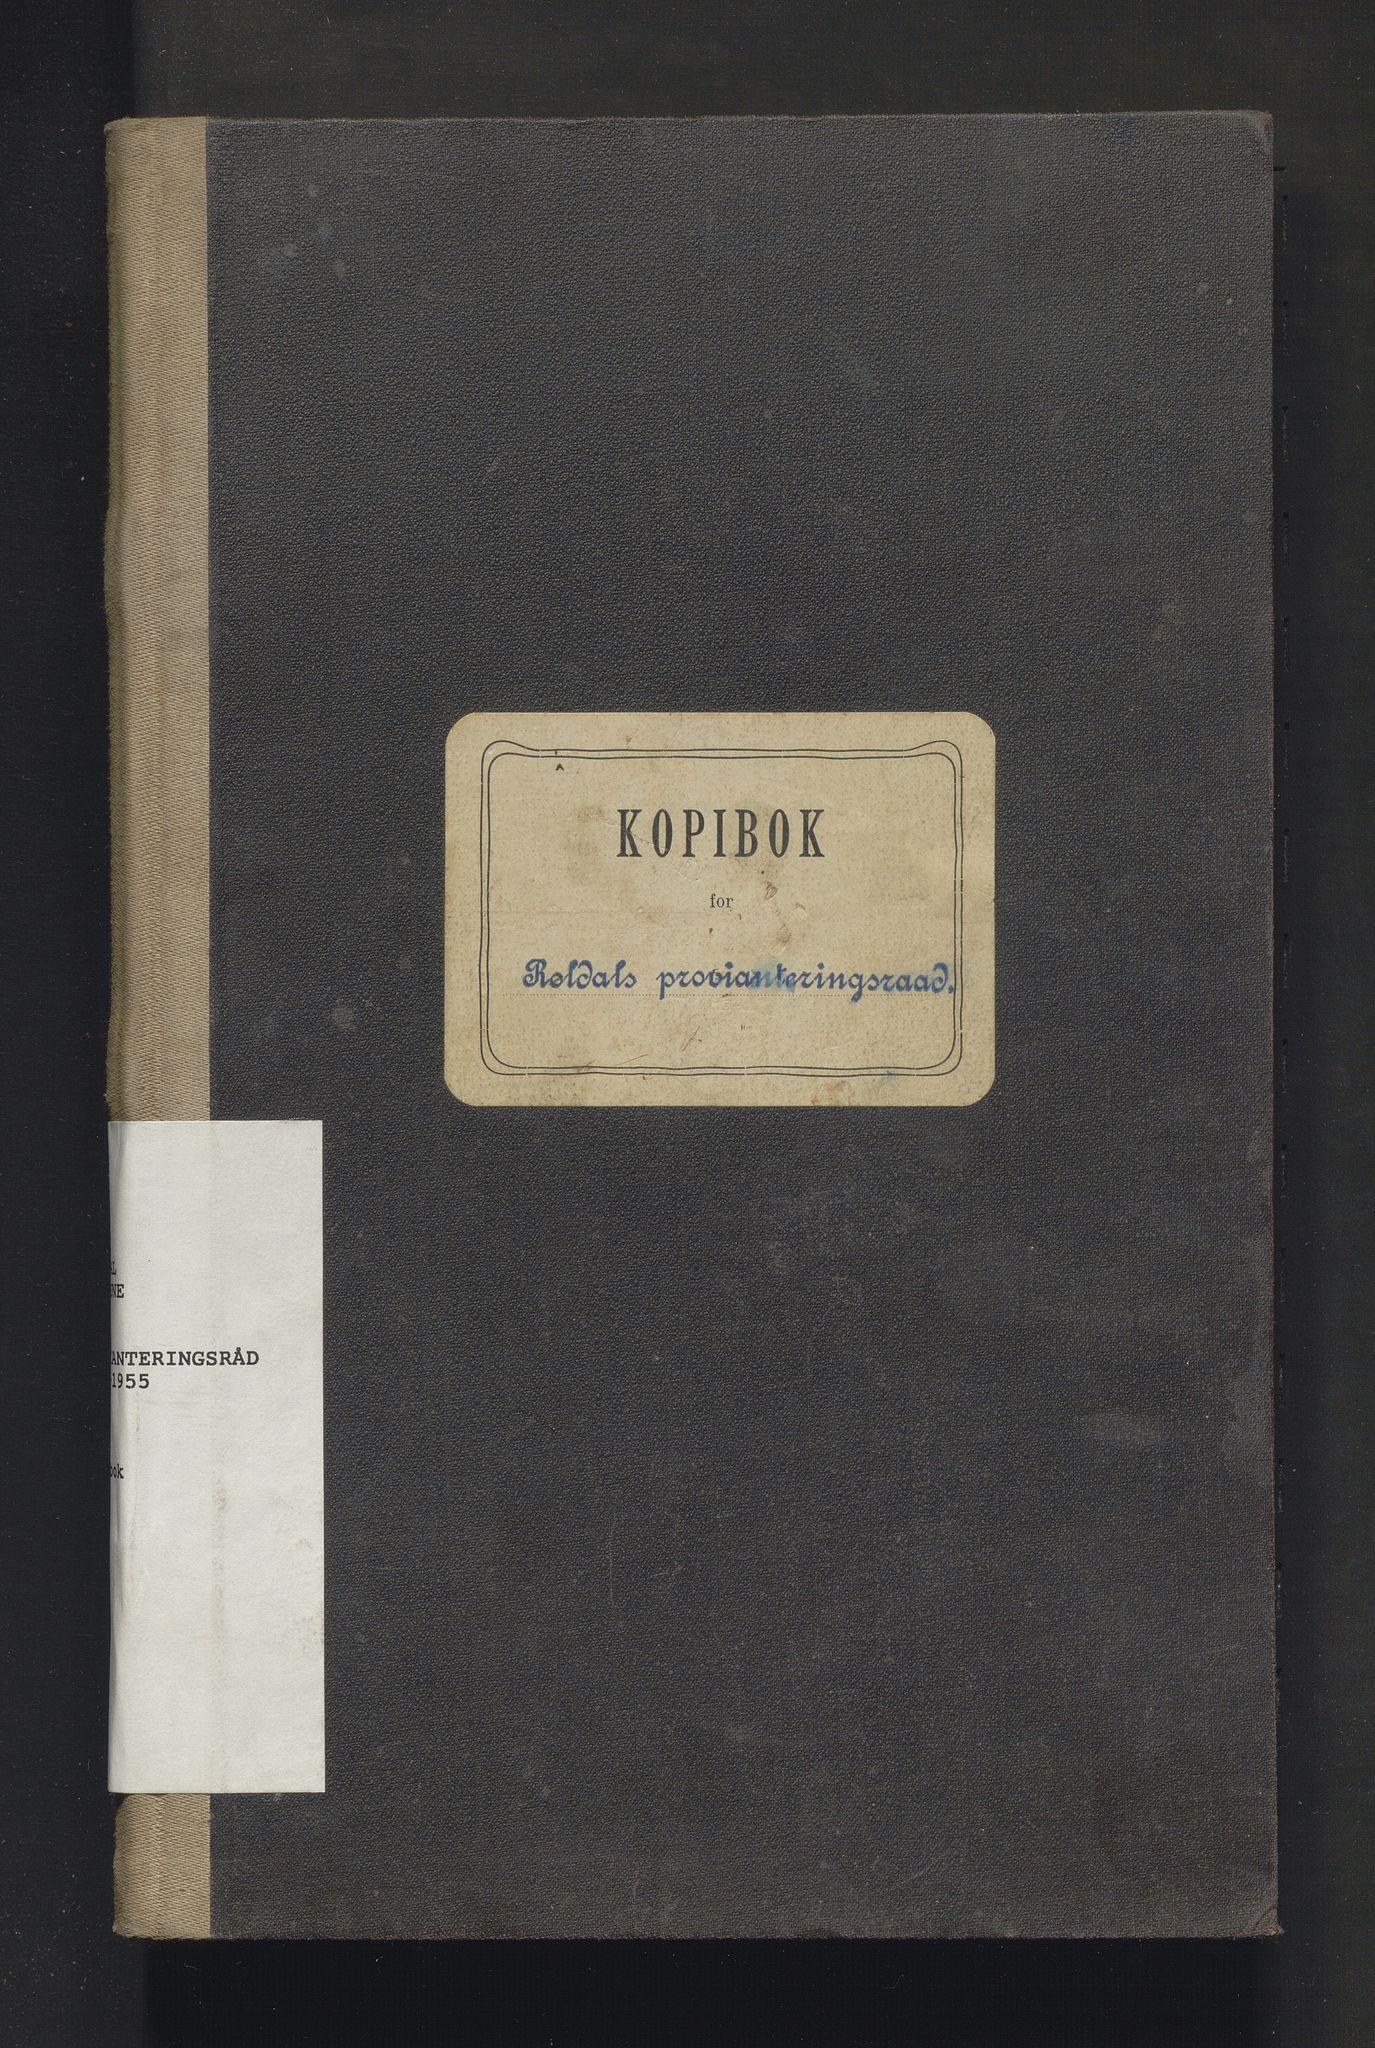 IKAH, Røldal kommune. Provianteringsrådet, B/Ba/L0001: Kopibok for Røldal provianteringsråd, 1916-1920